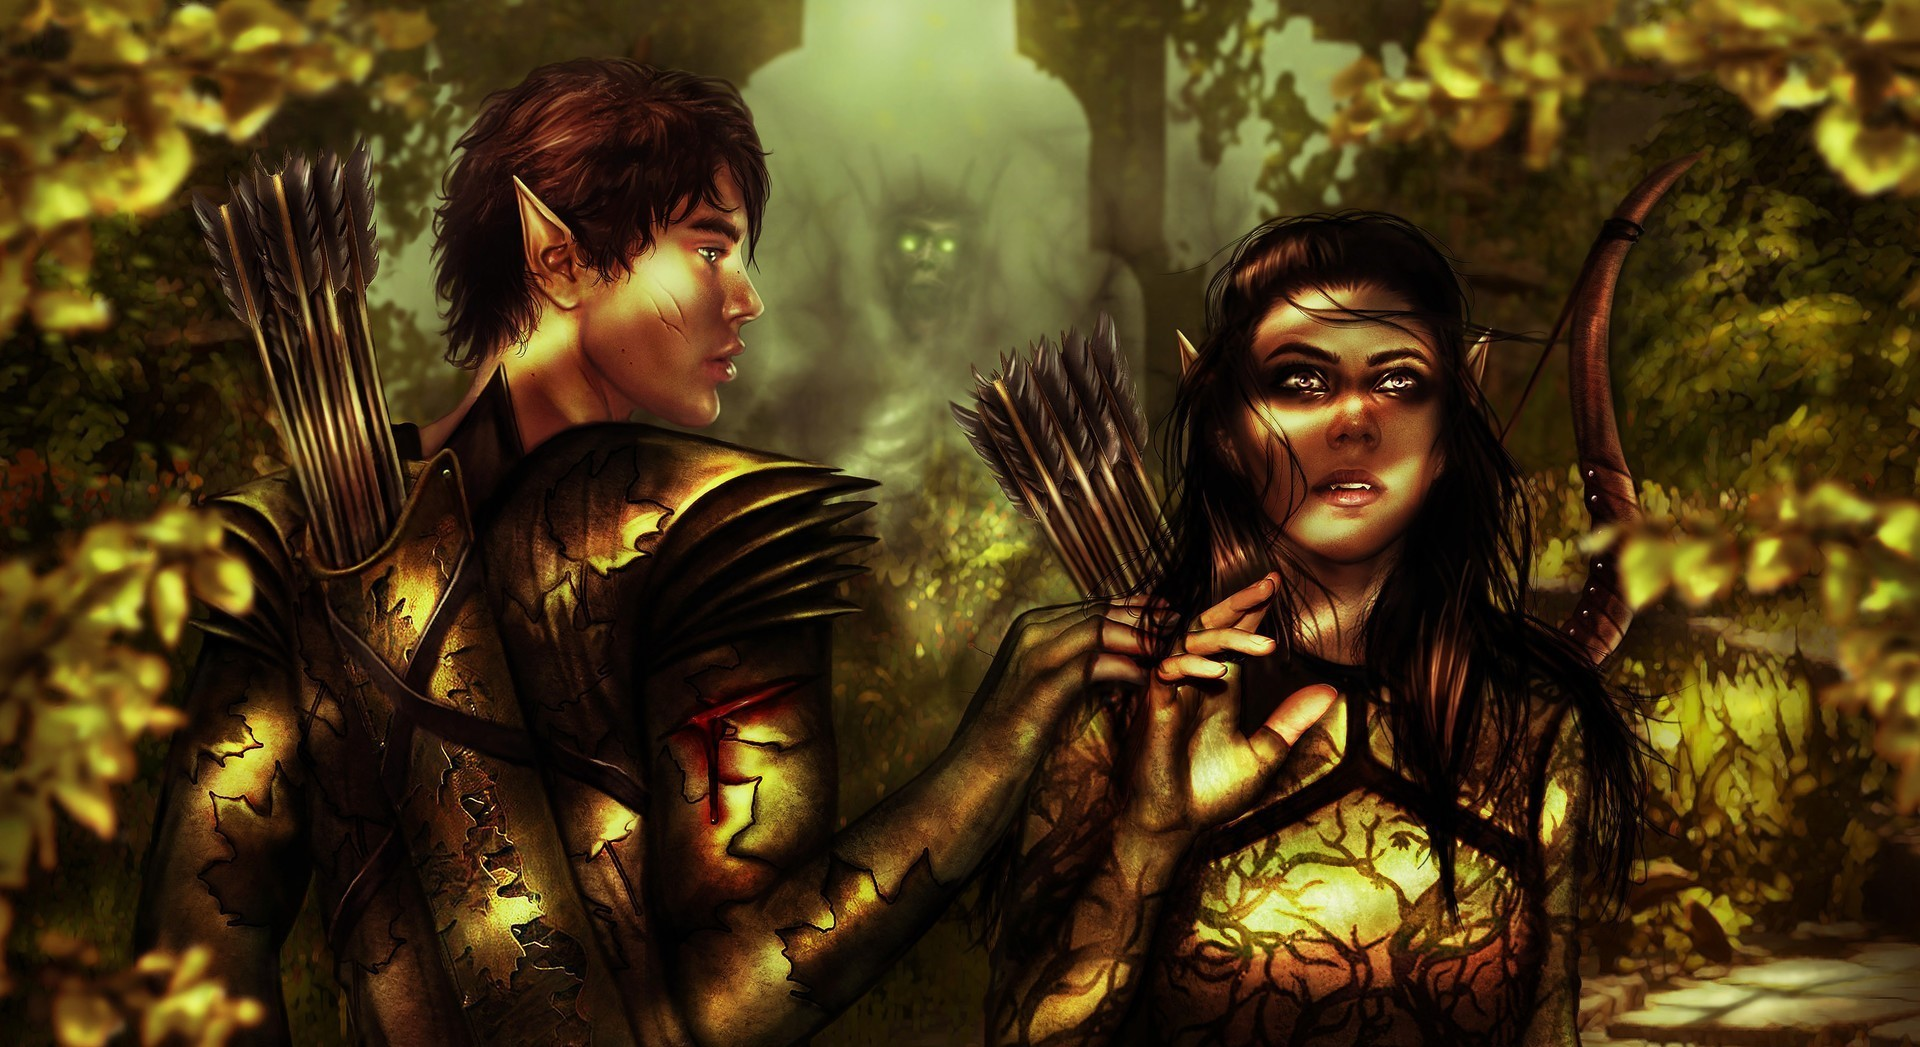 General 1920x1047 fantasy art artwork Fantasy Men fantasy girl elves